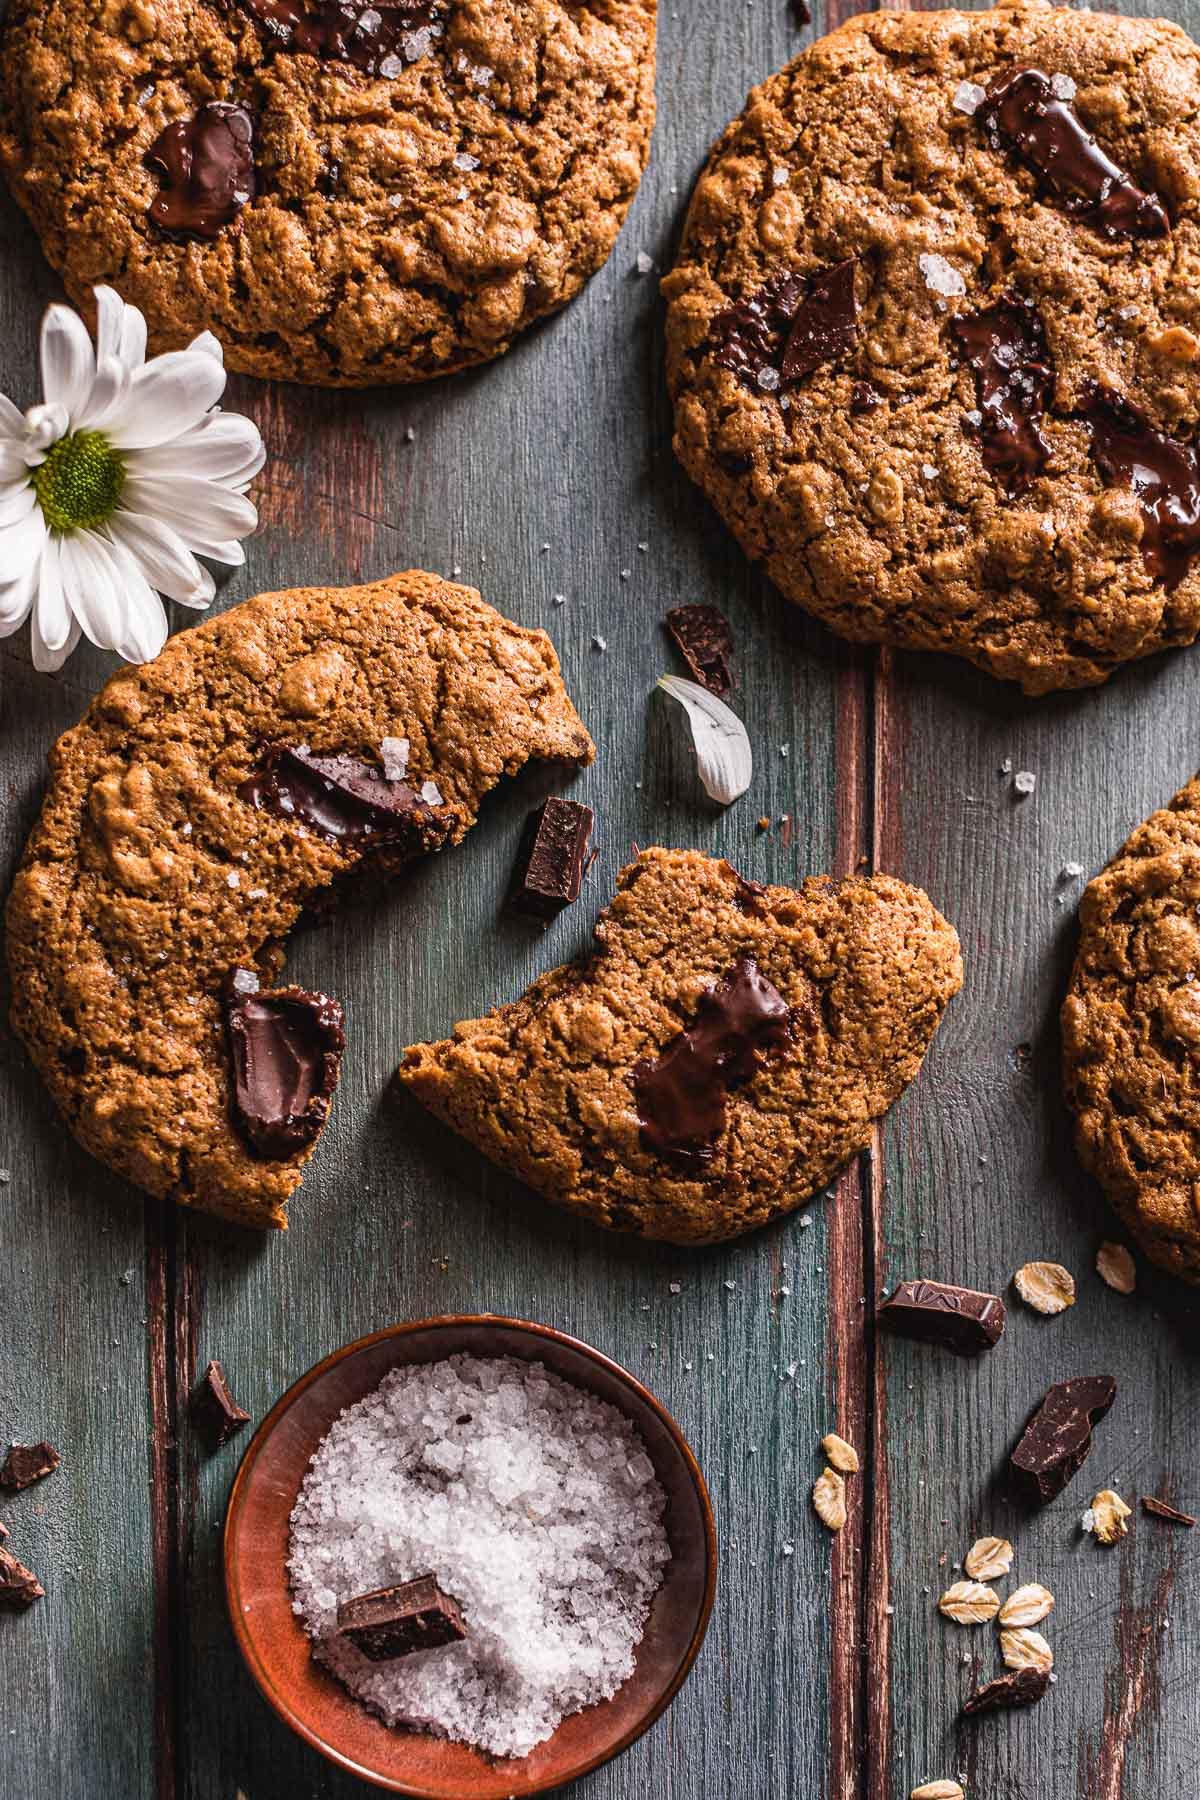 oil-free almond butter Gluten-free healthy Vegan Oatmeal Chocolate Chip Cookies Cookies vegani senza glutine al cioccolato senza olio al burro di mandorle